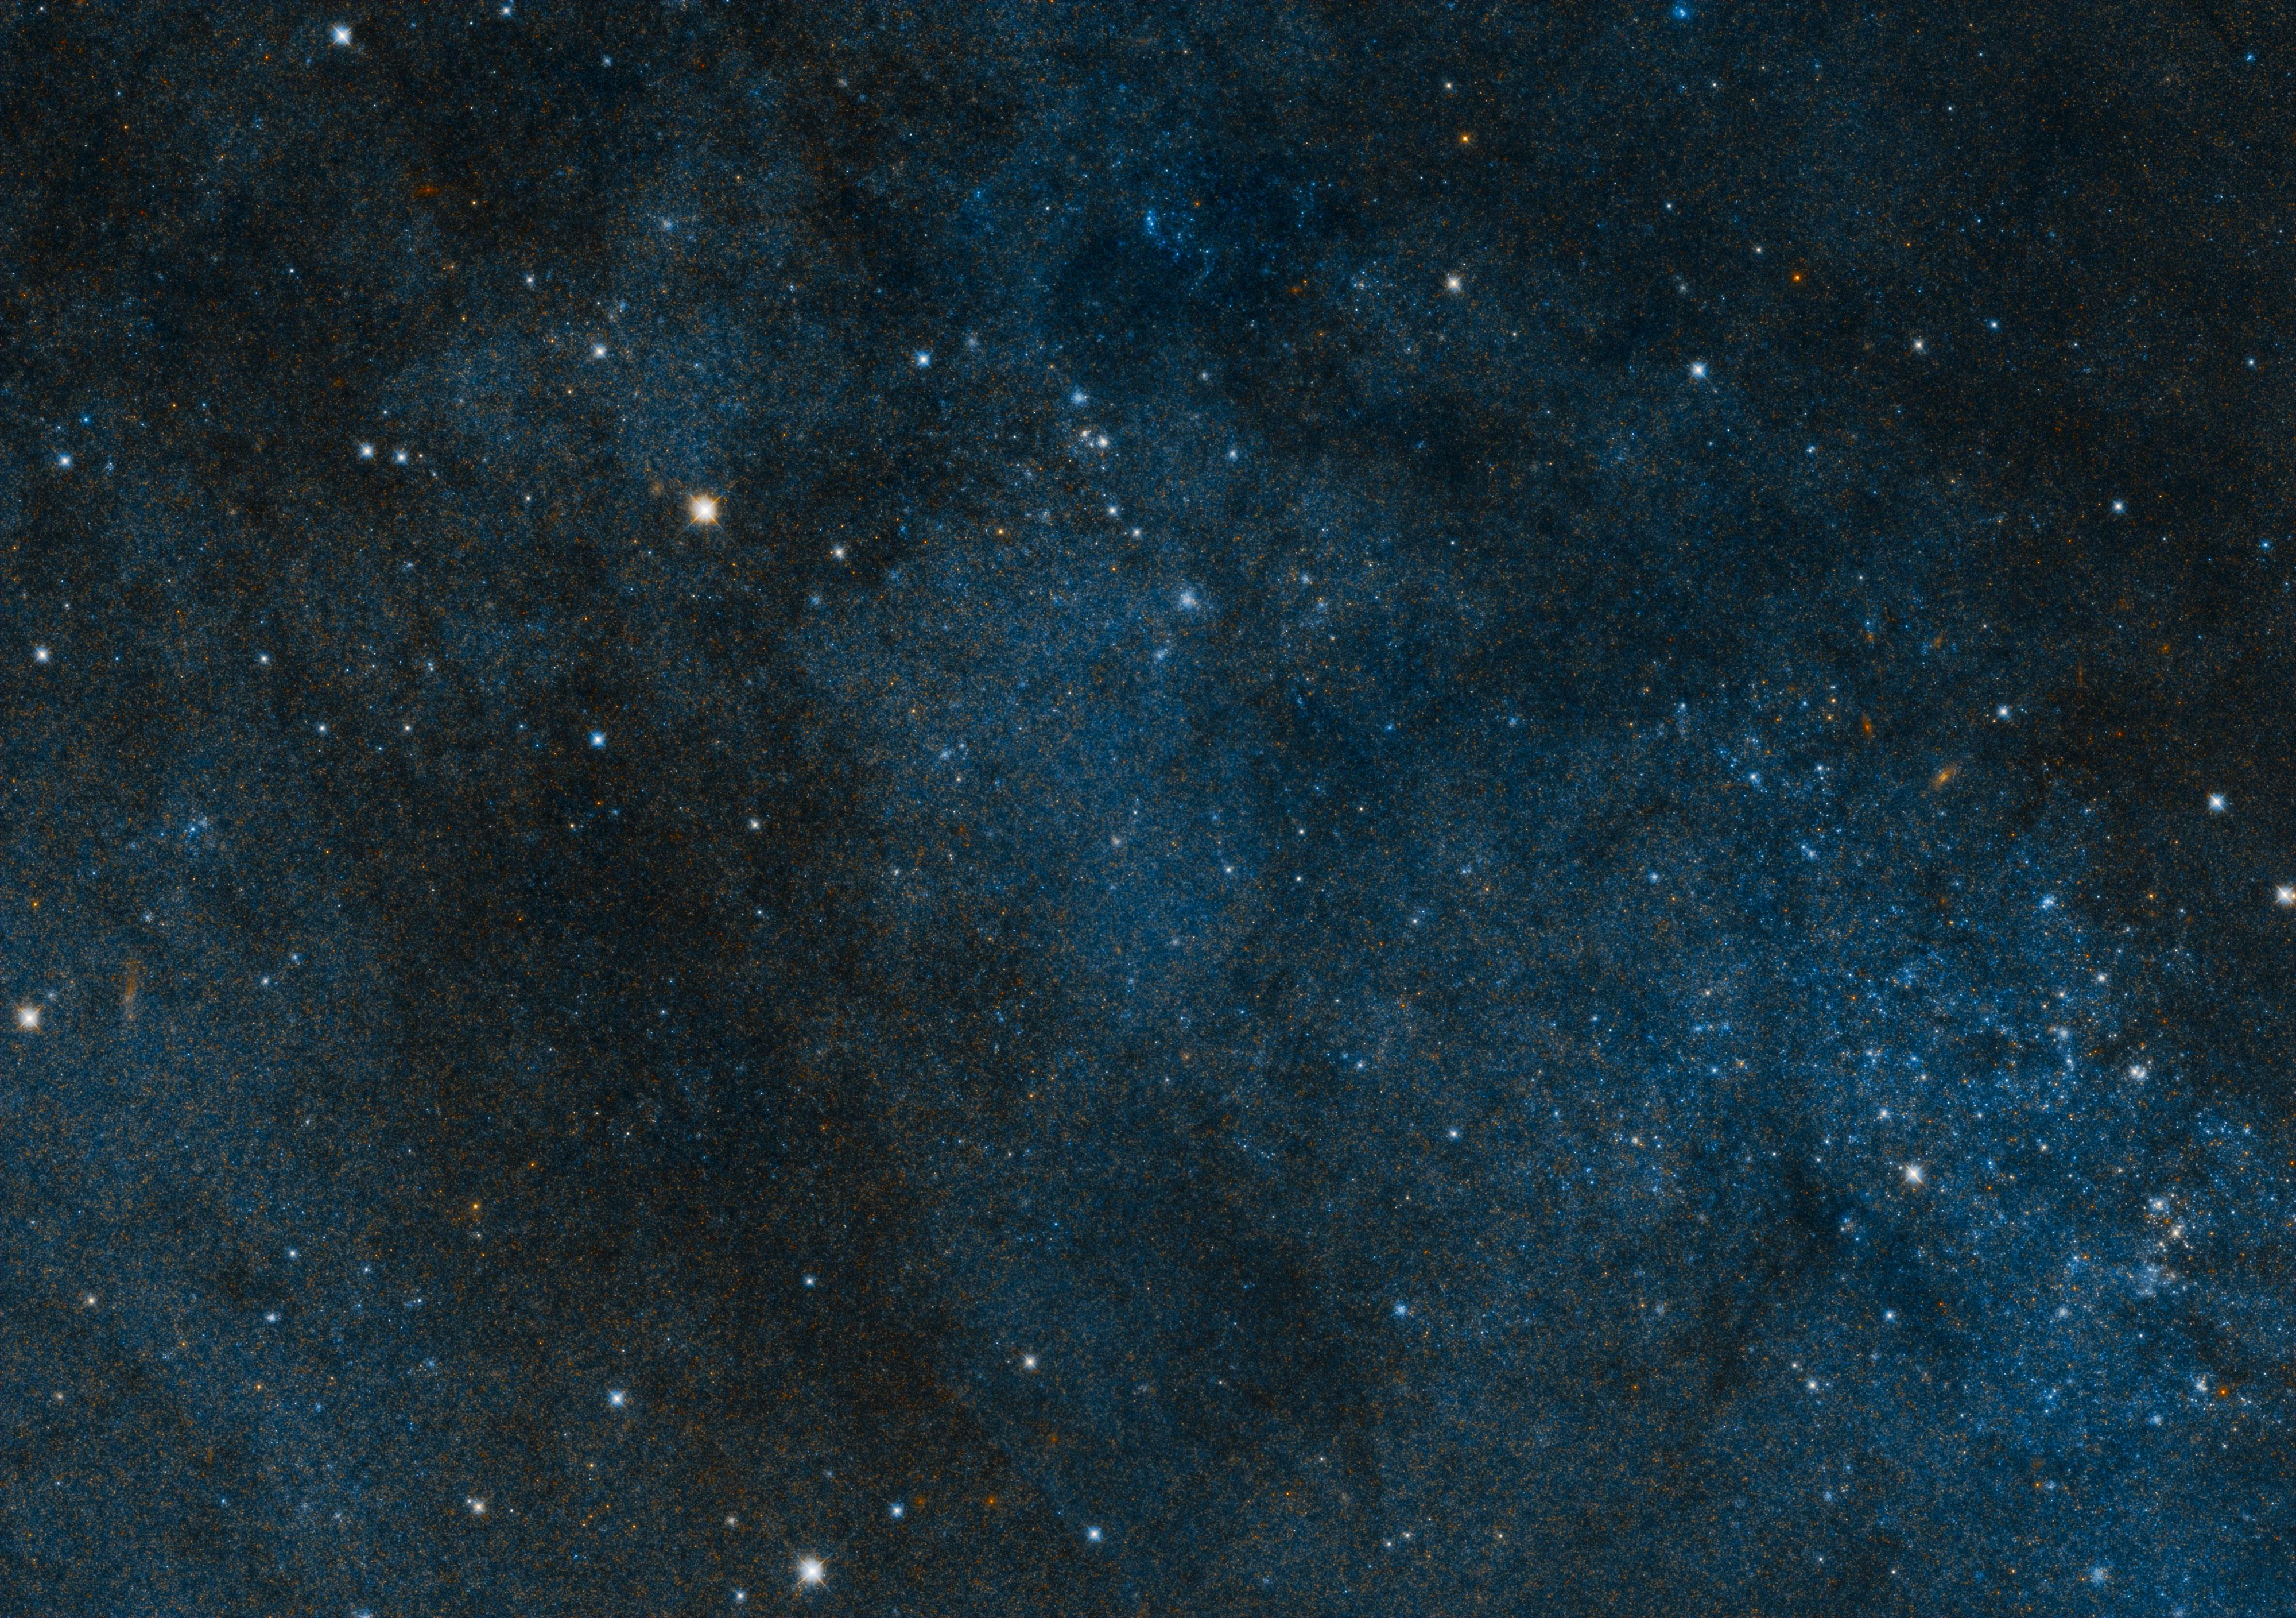 Hubble's Hidden Treasures Contest 2012 - Page 4 - Starship ...